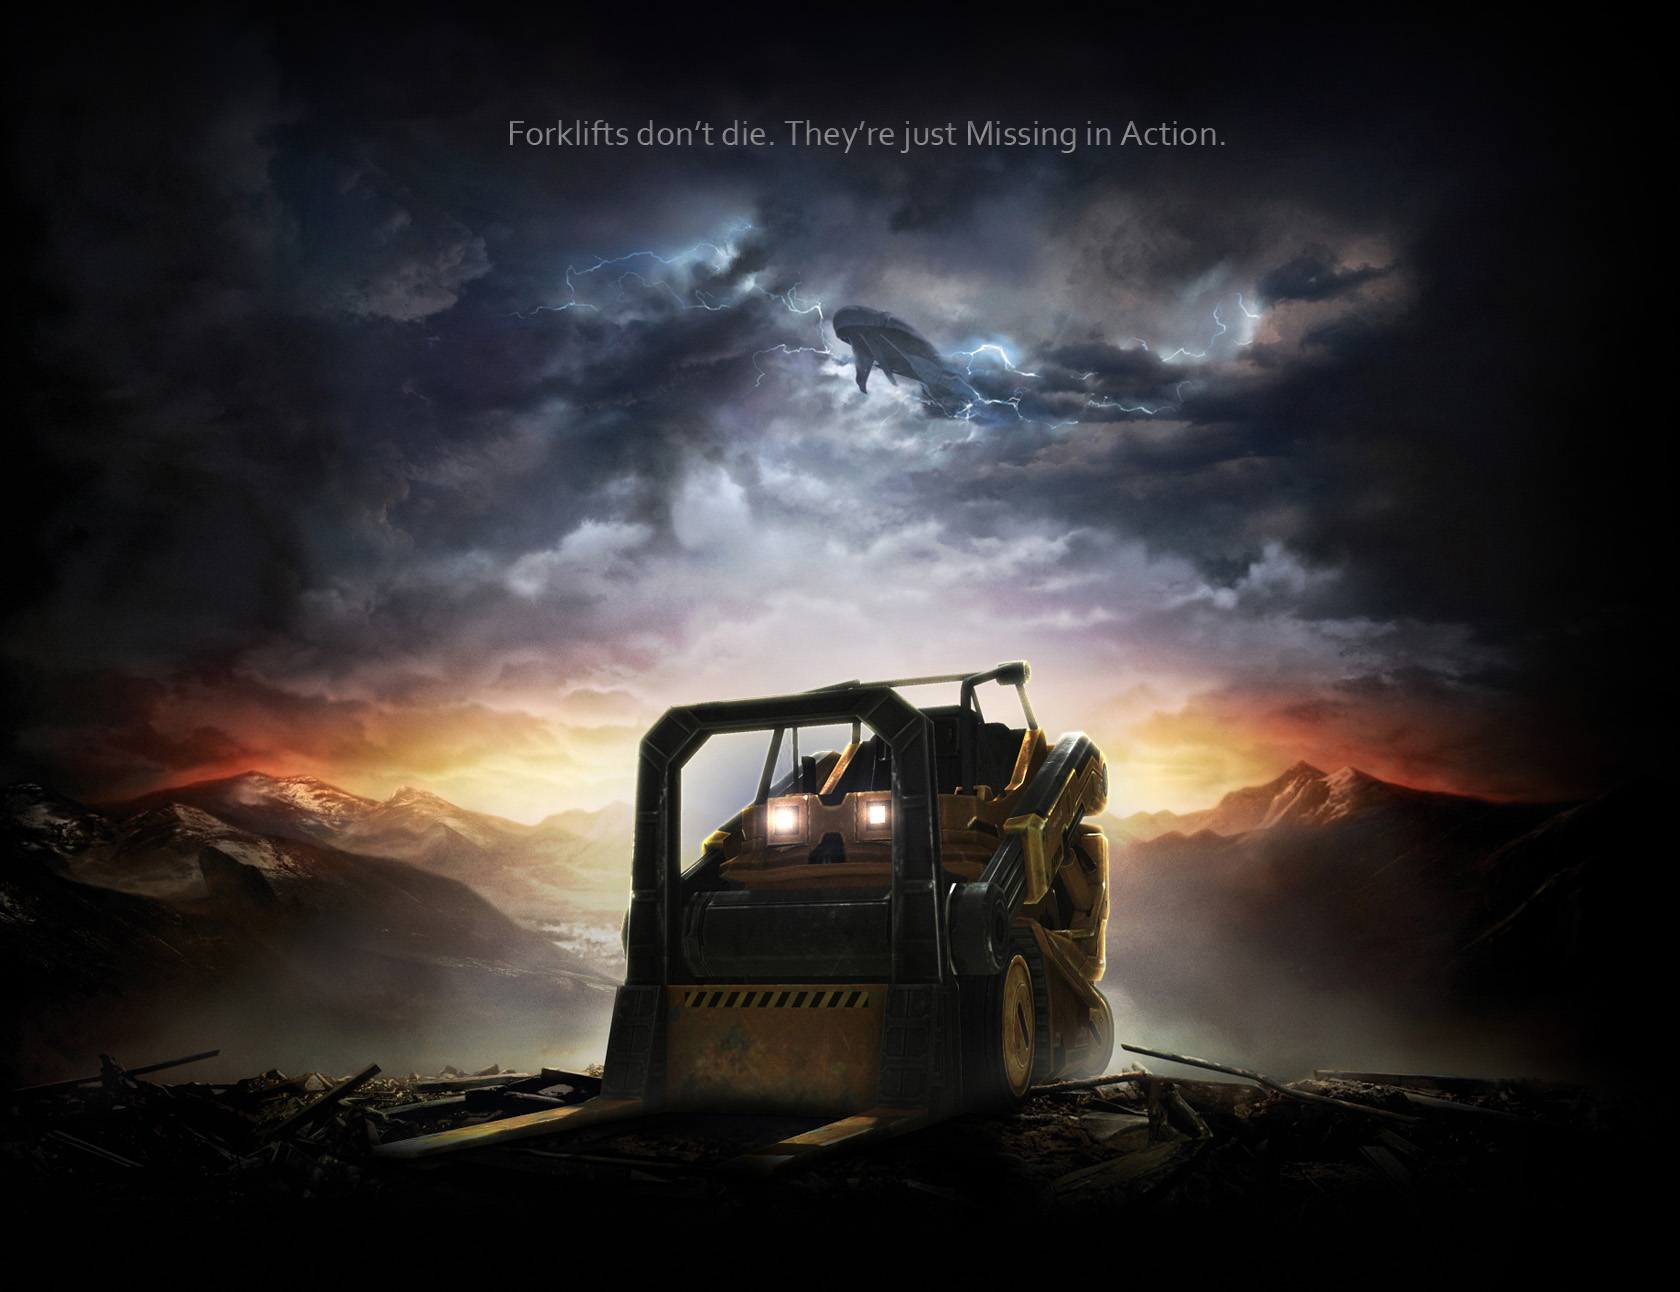 Halo Reach Forklift Wallpaper by Vengeance2010 on DeviantArt